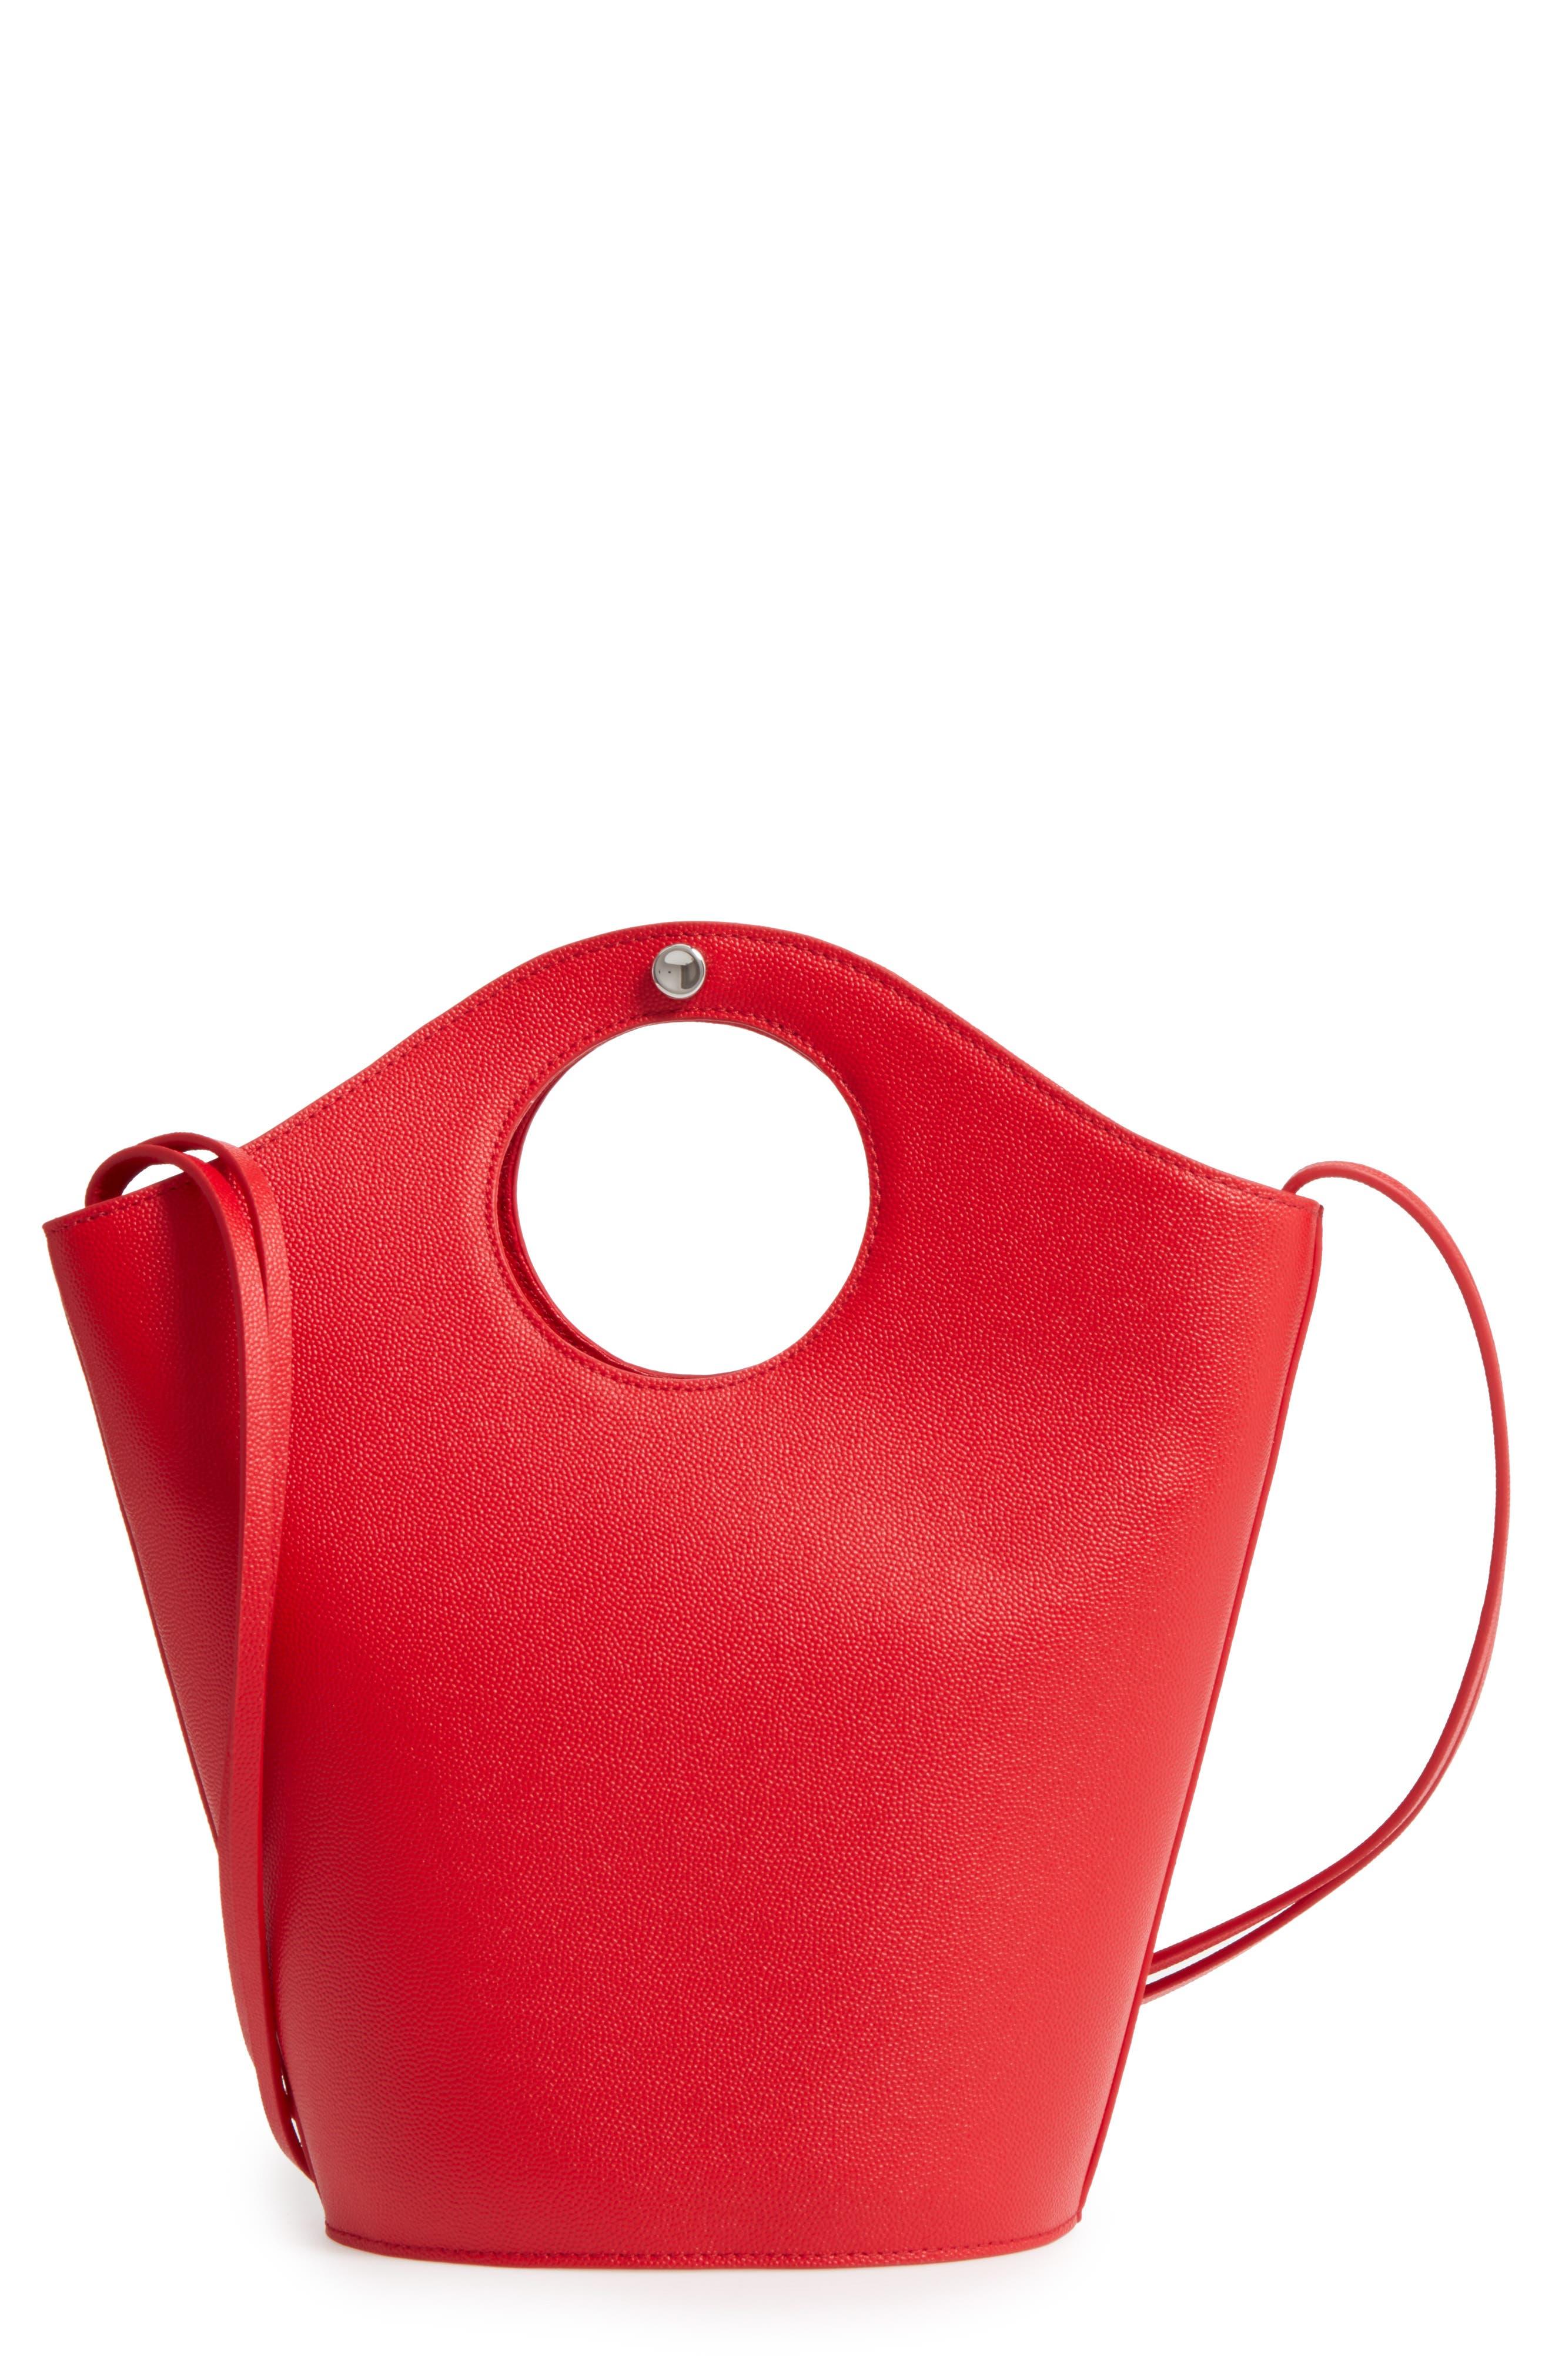 Small Market Leather Shopper,                         Main,                         color, 640